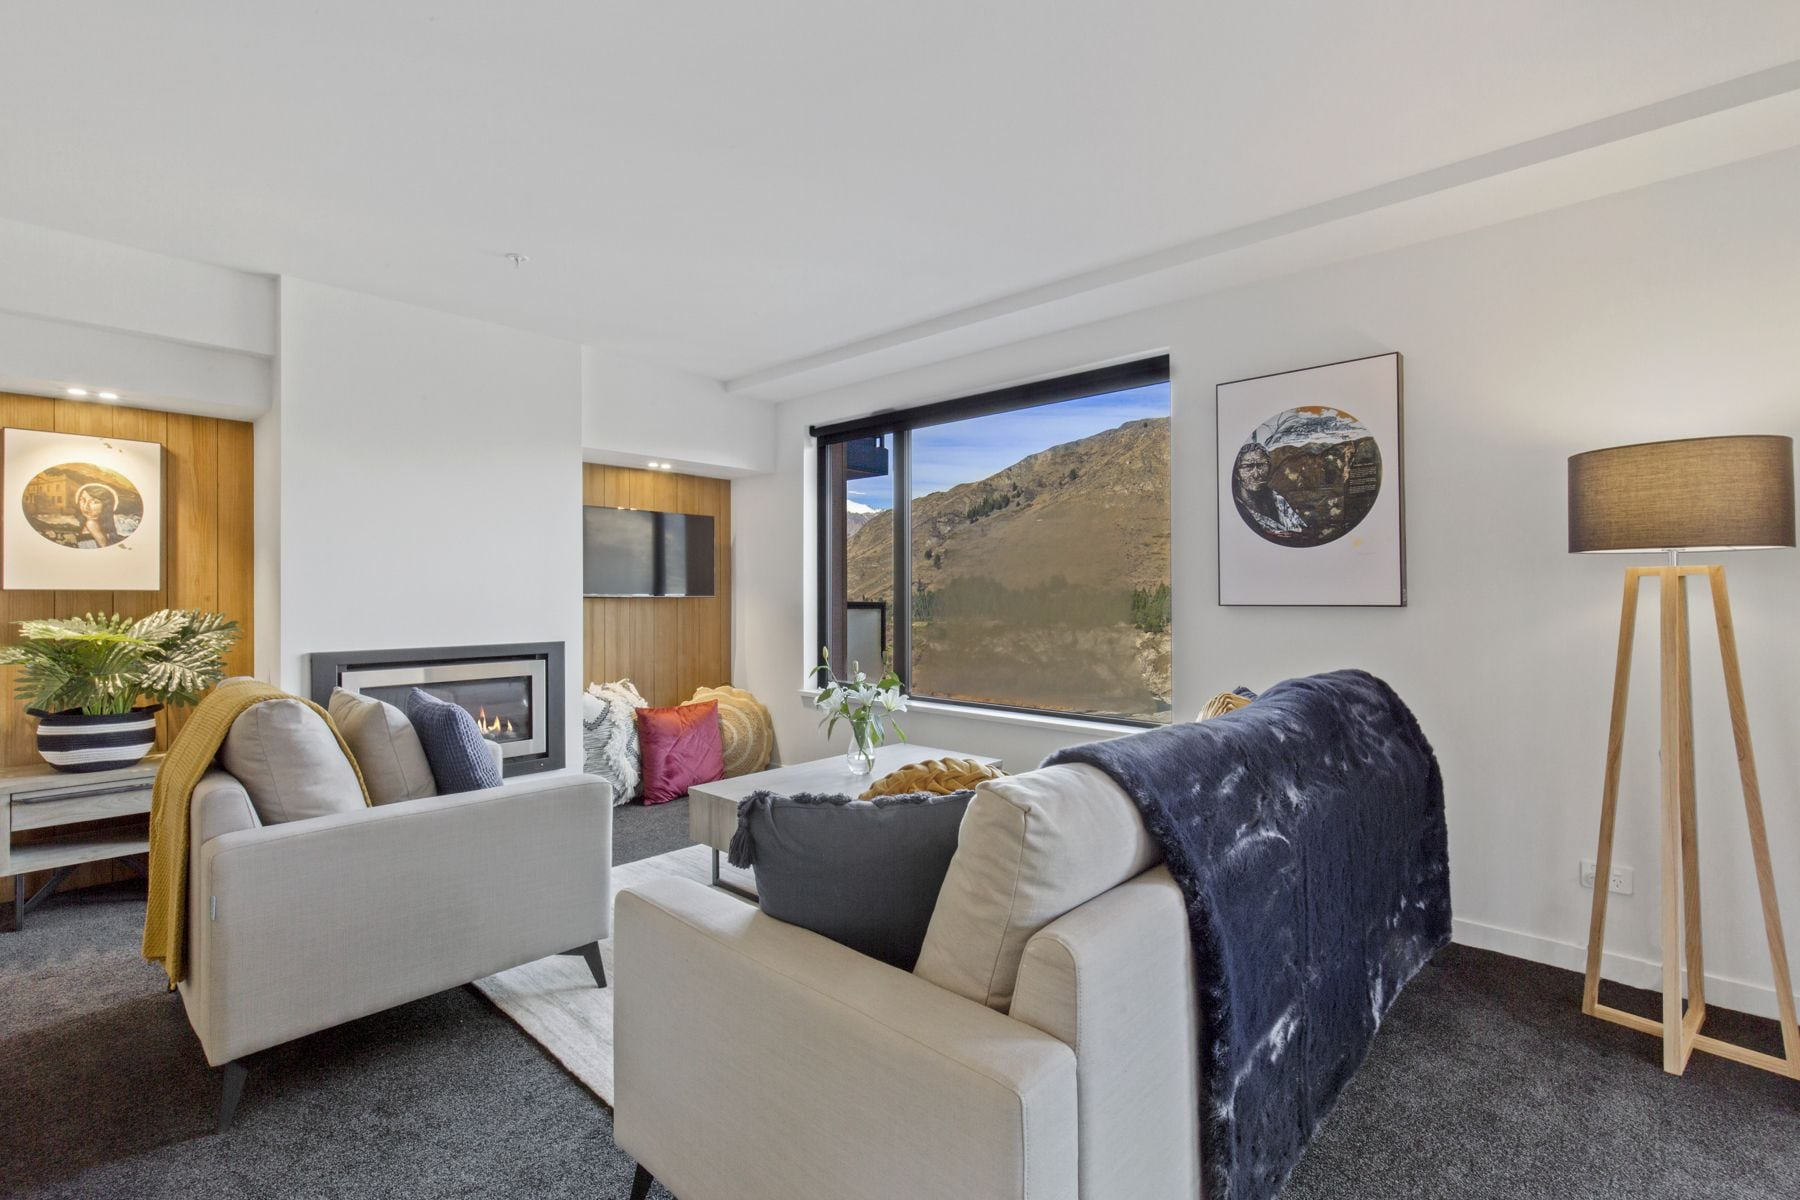 Awa Apartment, Queenstown-Lakes